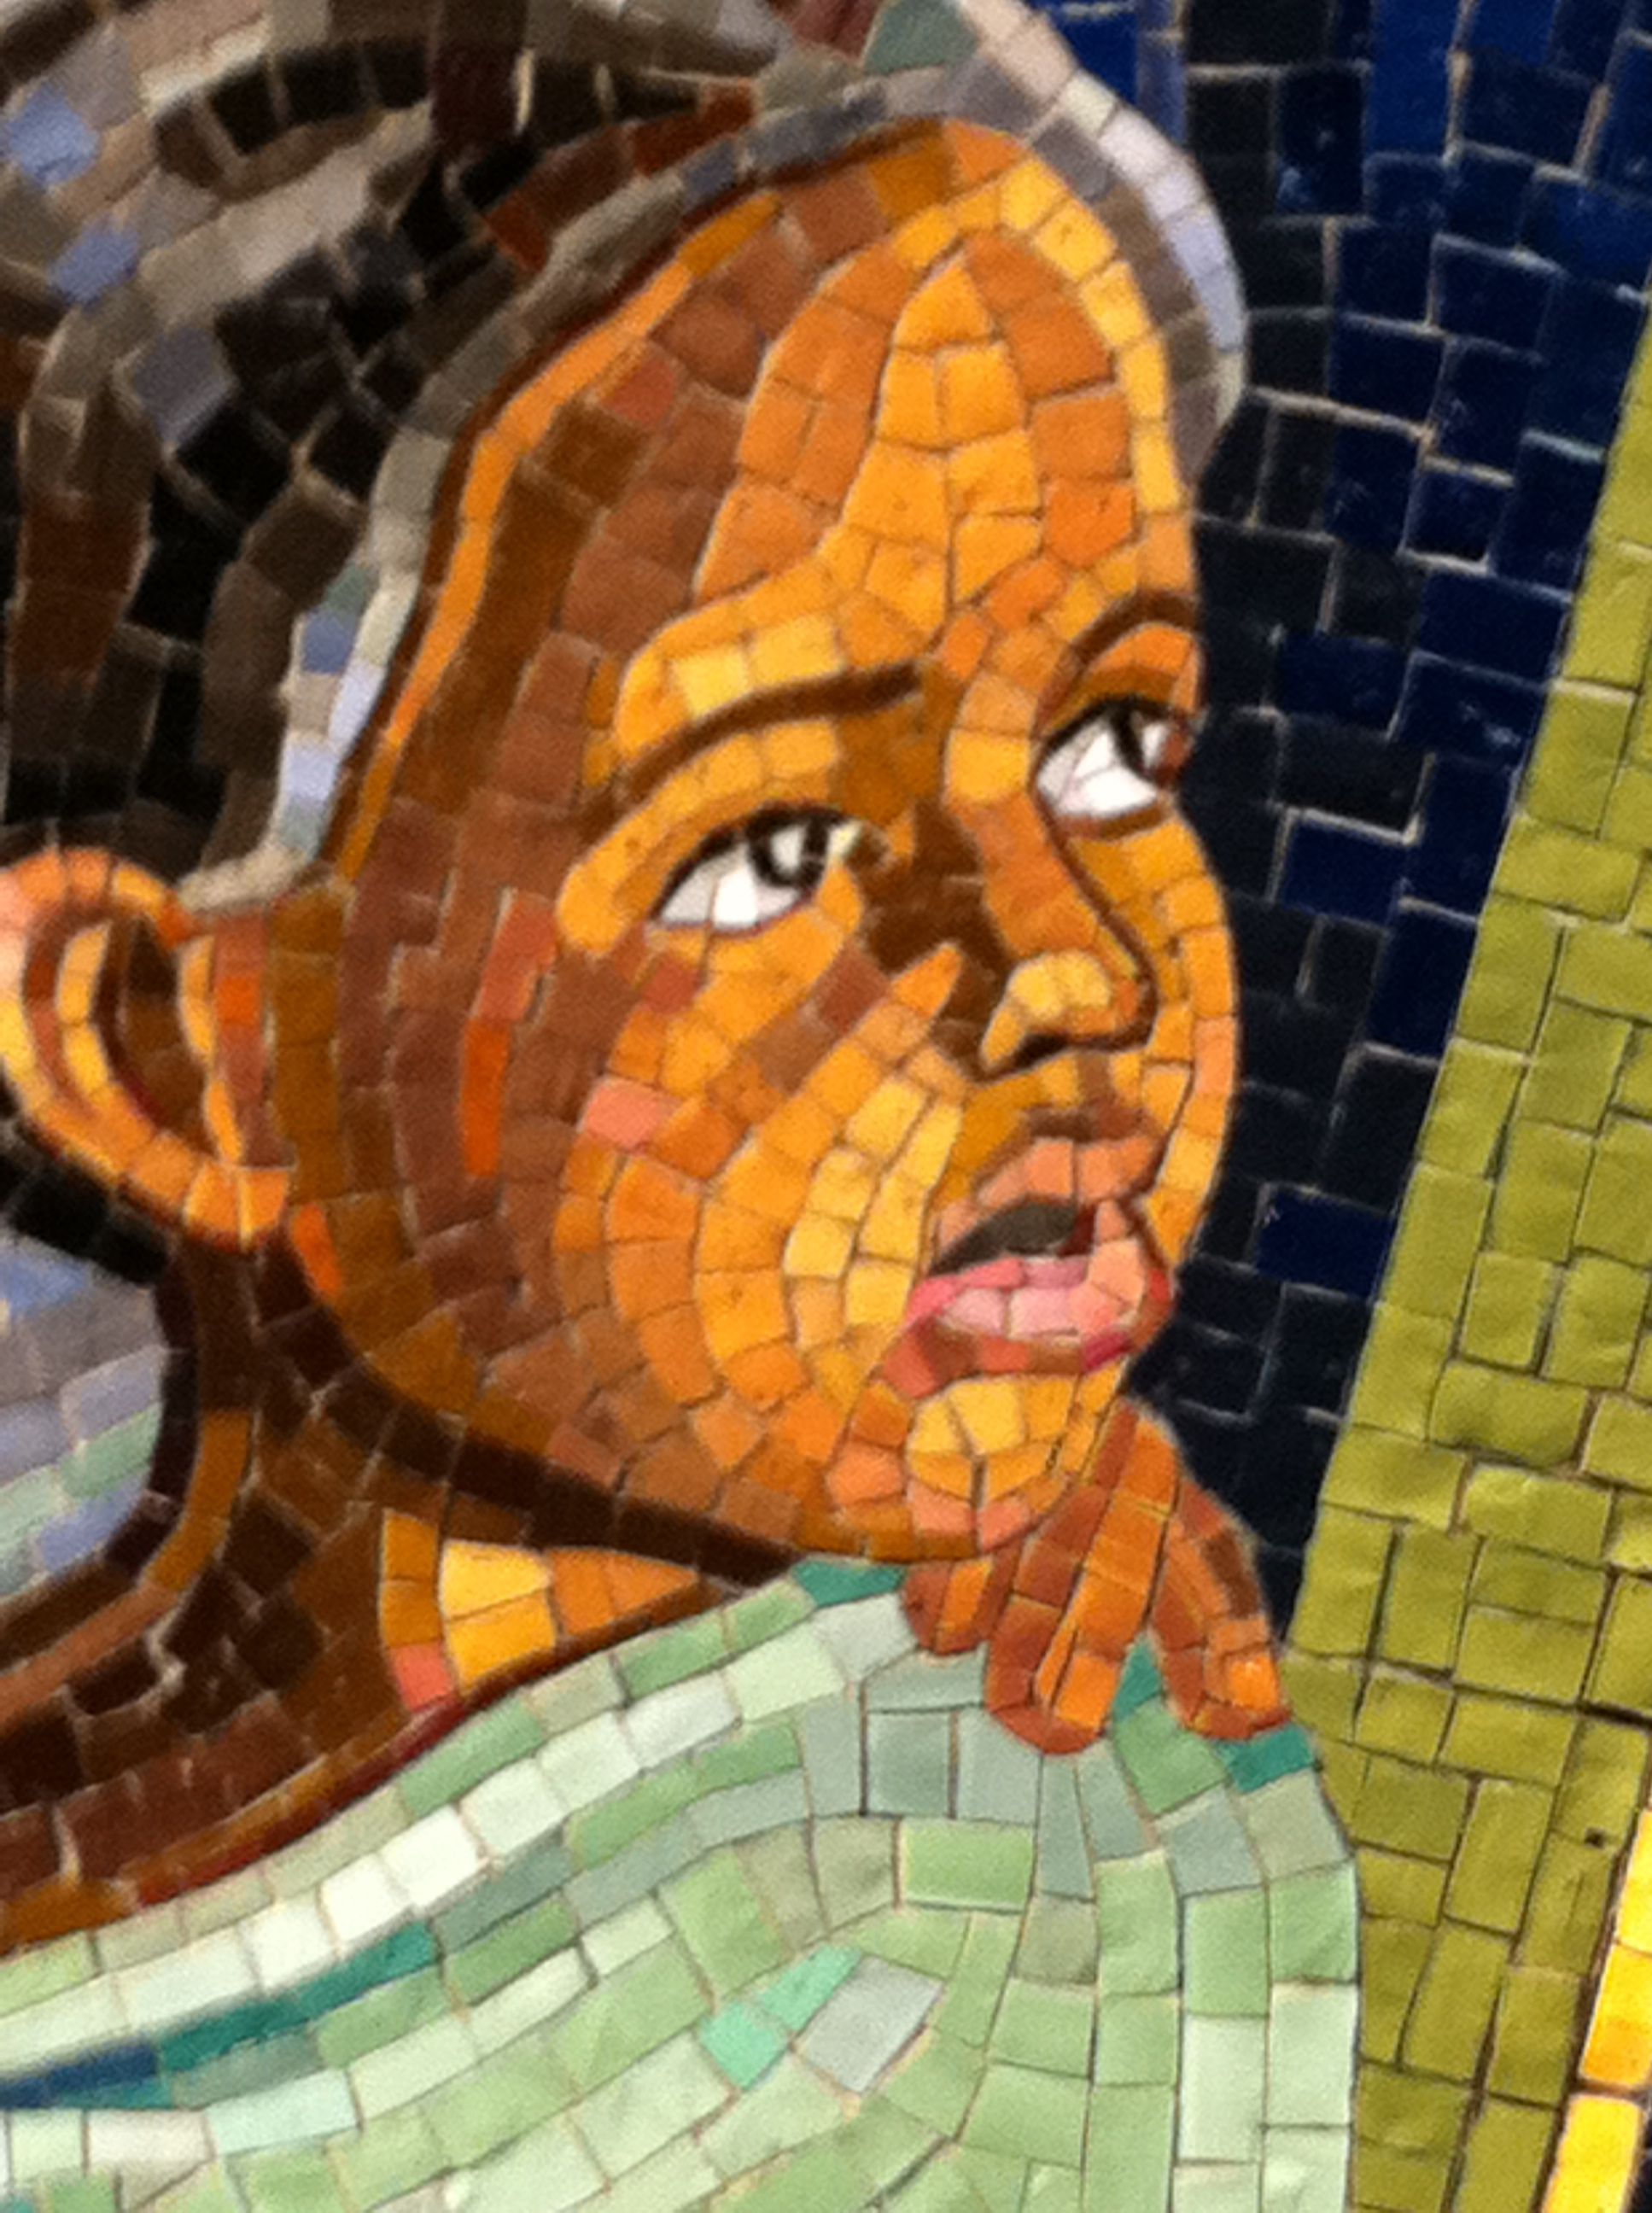 tile mosaic art in NYC's subways